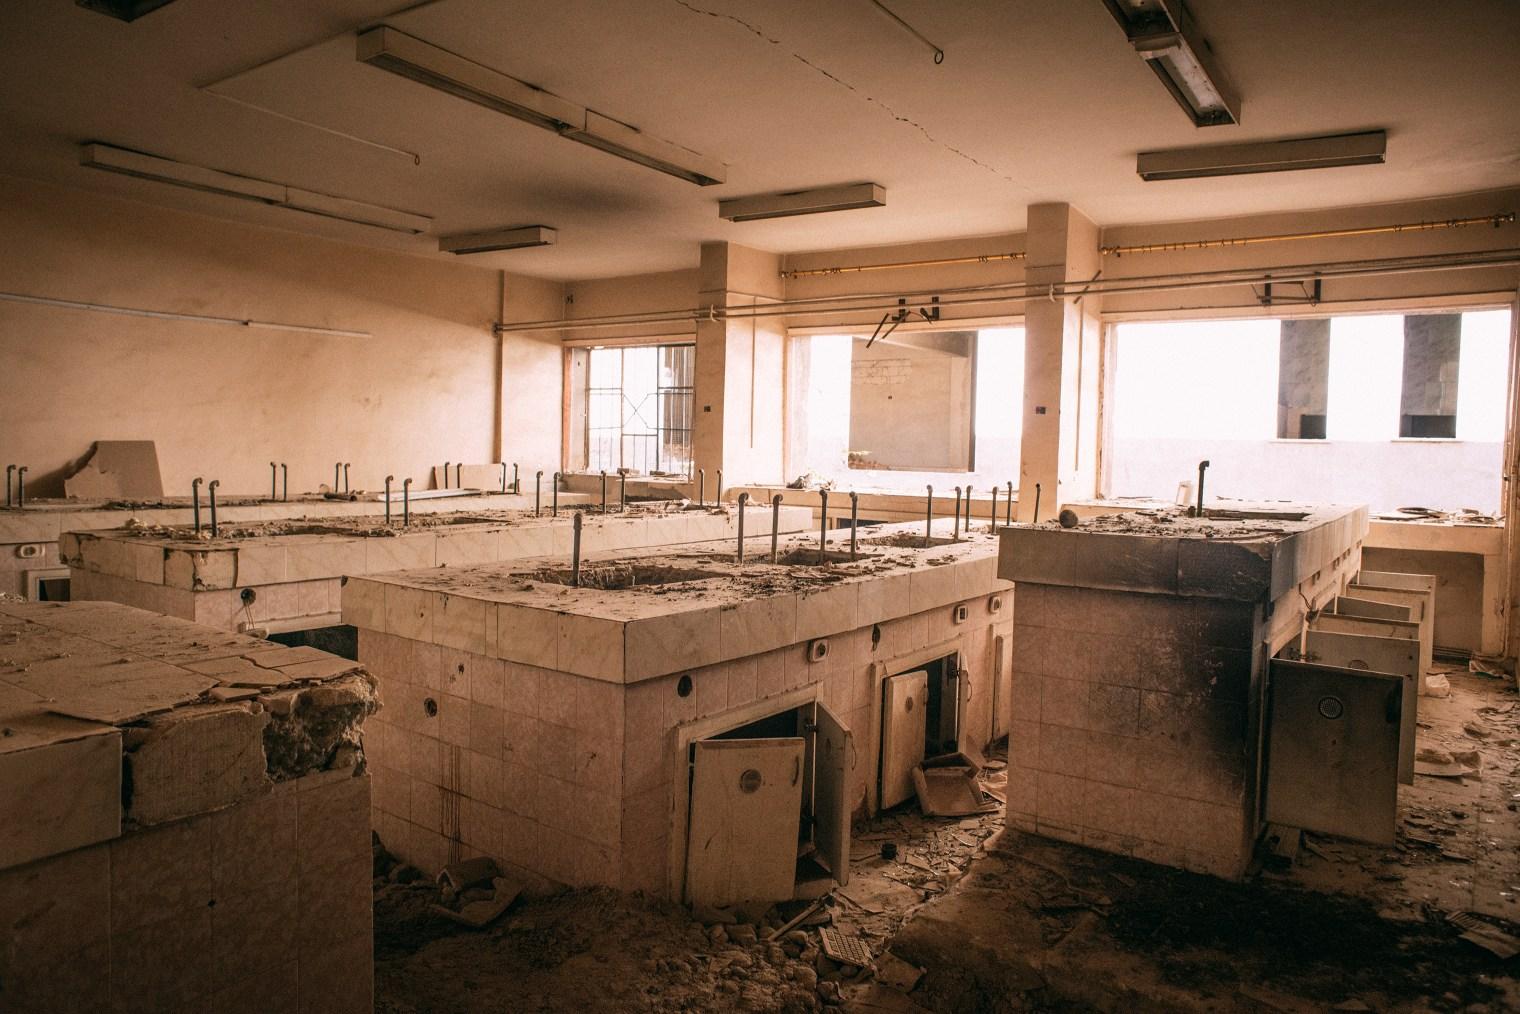 emanuele-satolli-raqqa-syria-reconstruction-chemistry-lab